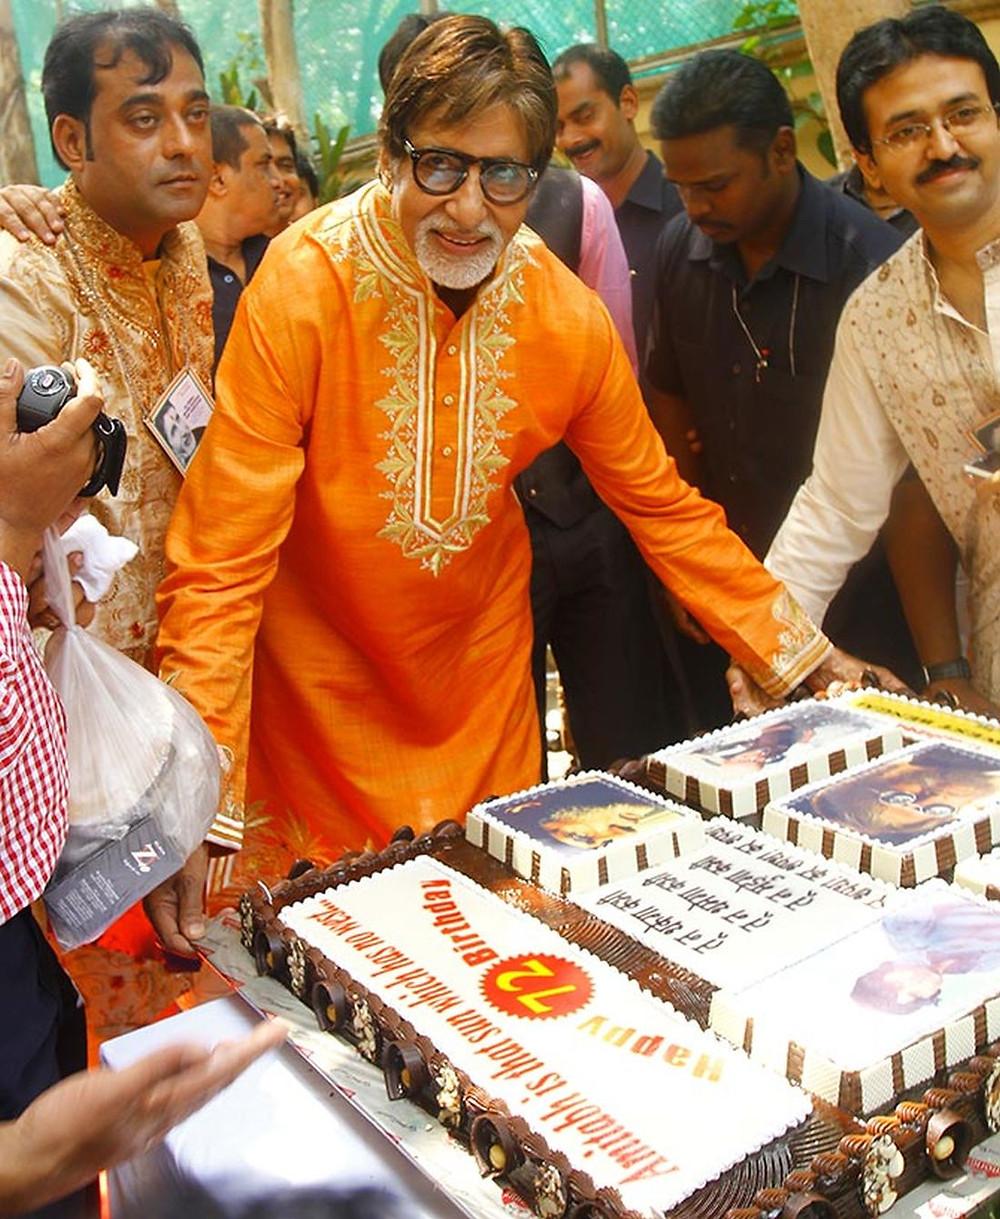 Amitabh Bachchan celebrates his 72nd birthday